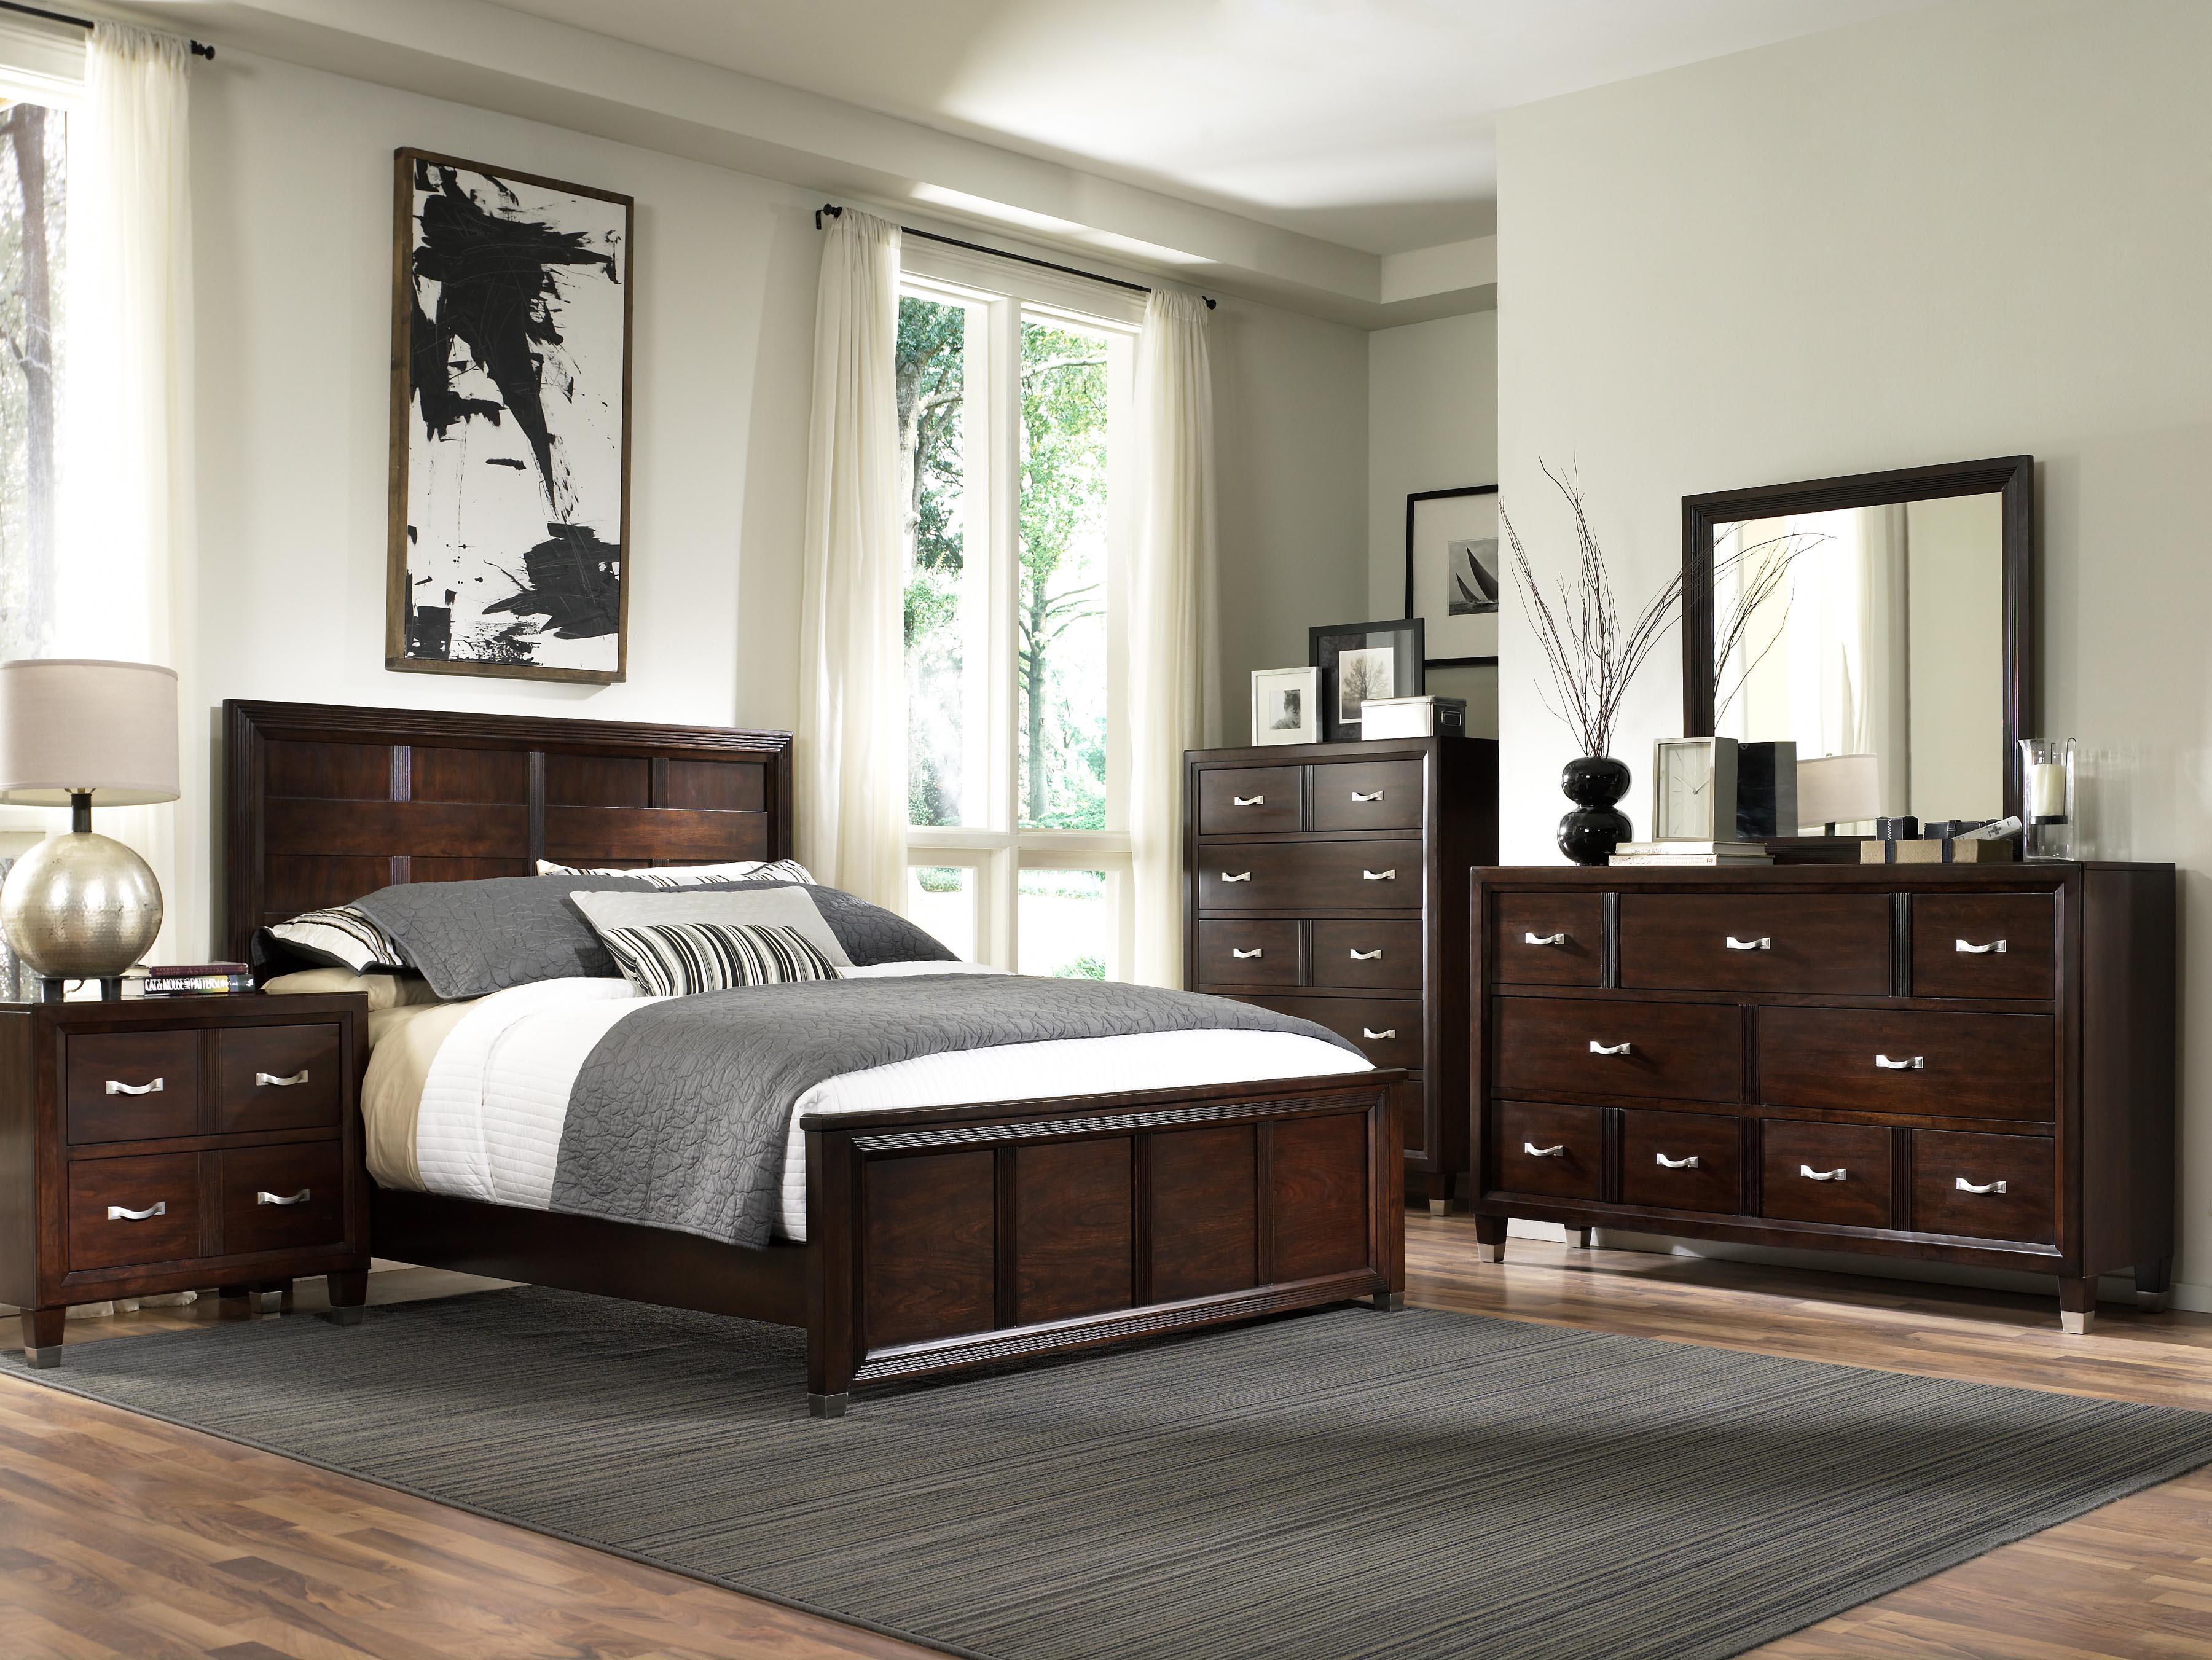 broyhill furniture eastlake 2 queen bedroom group wayside furniture